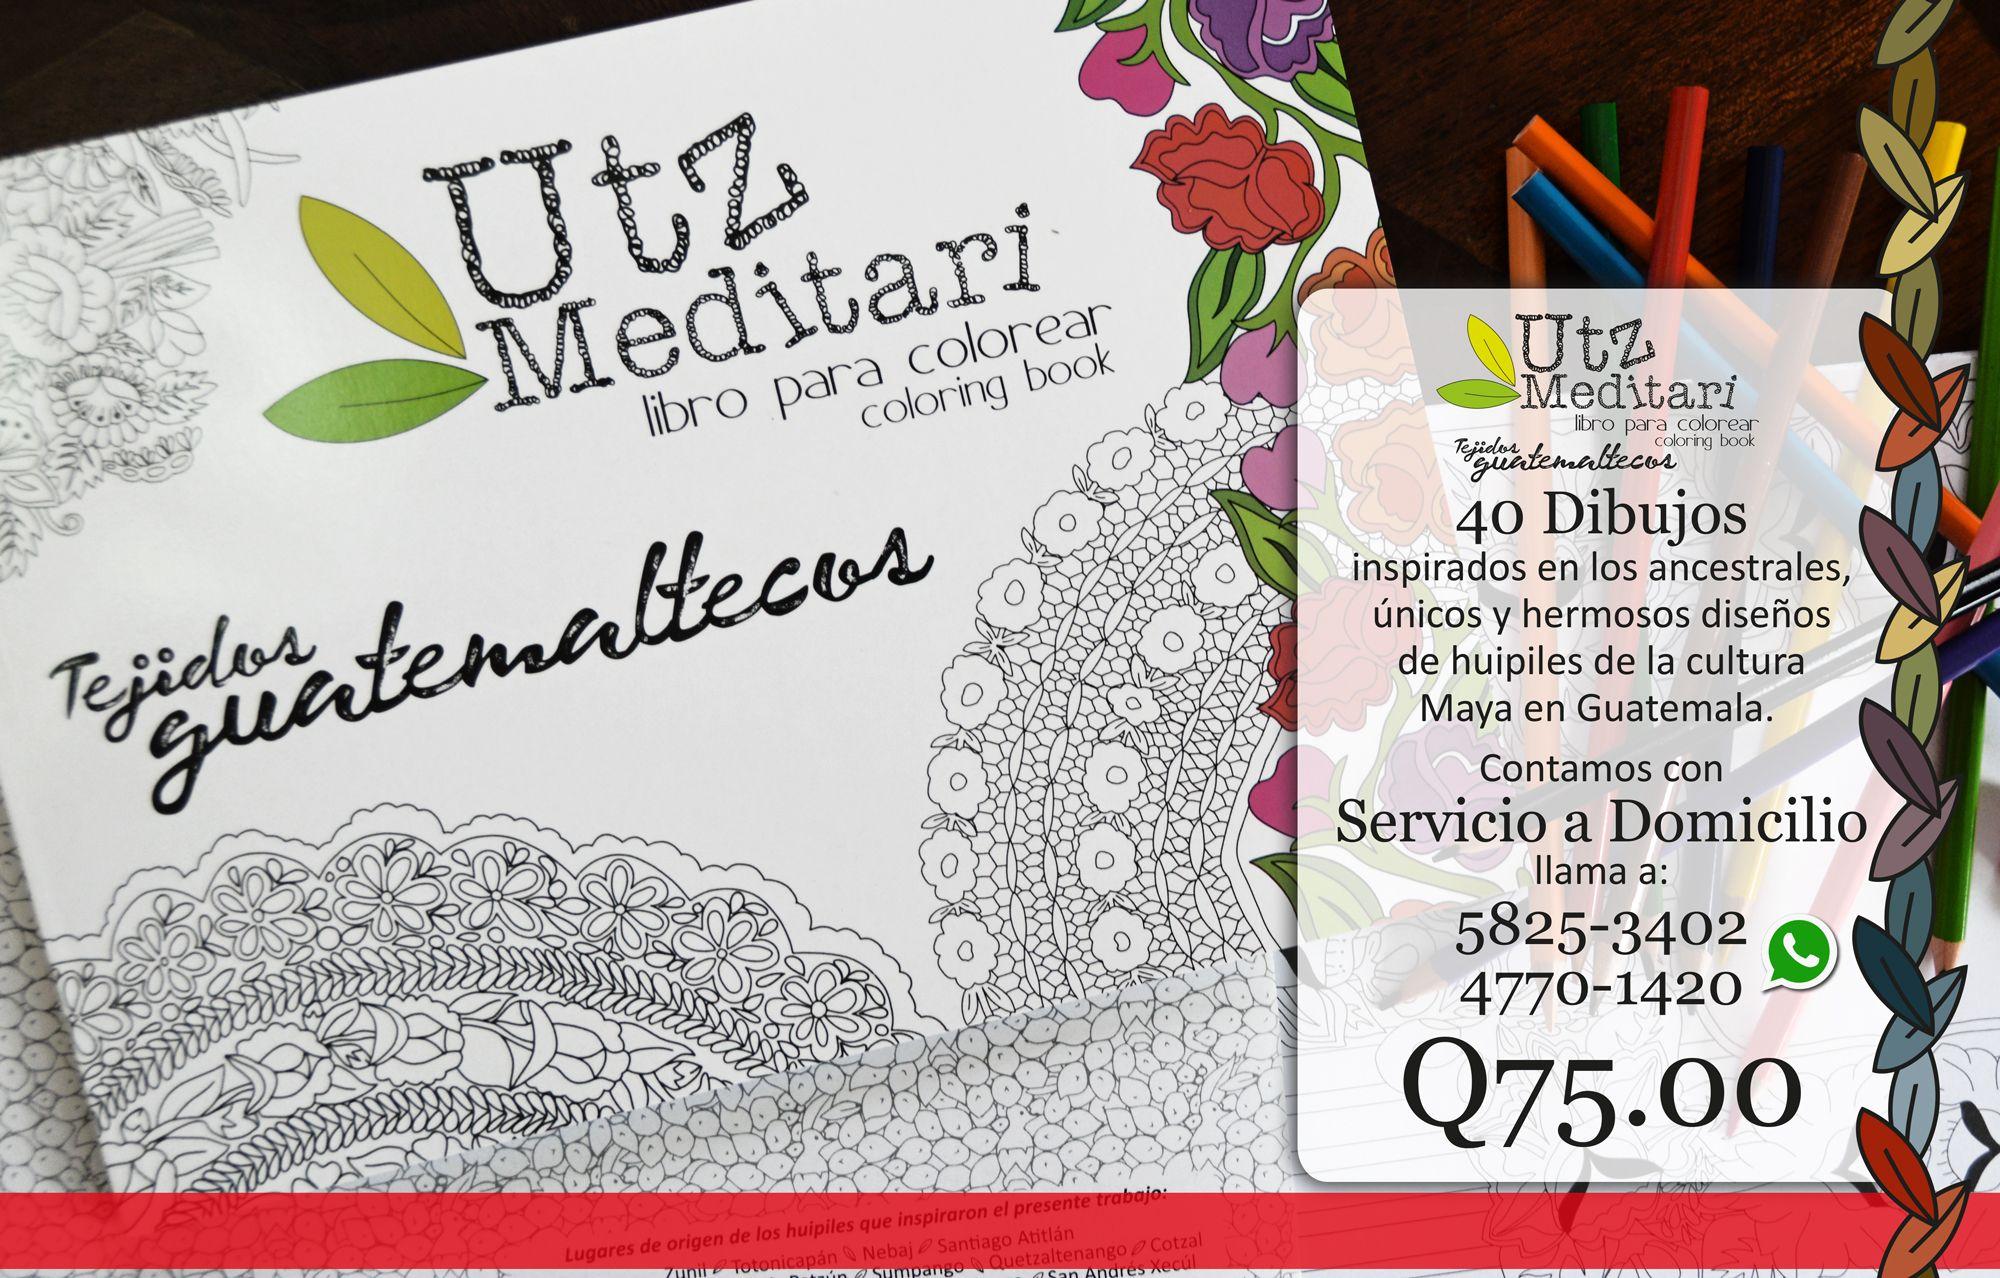 UTZ MEDITARI Libro para Colorear con diseños inspirados en Huipiles ...